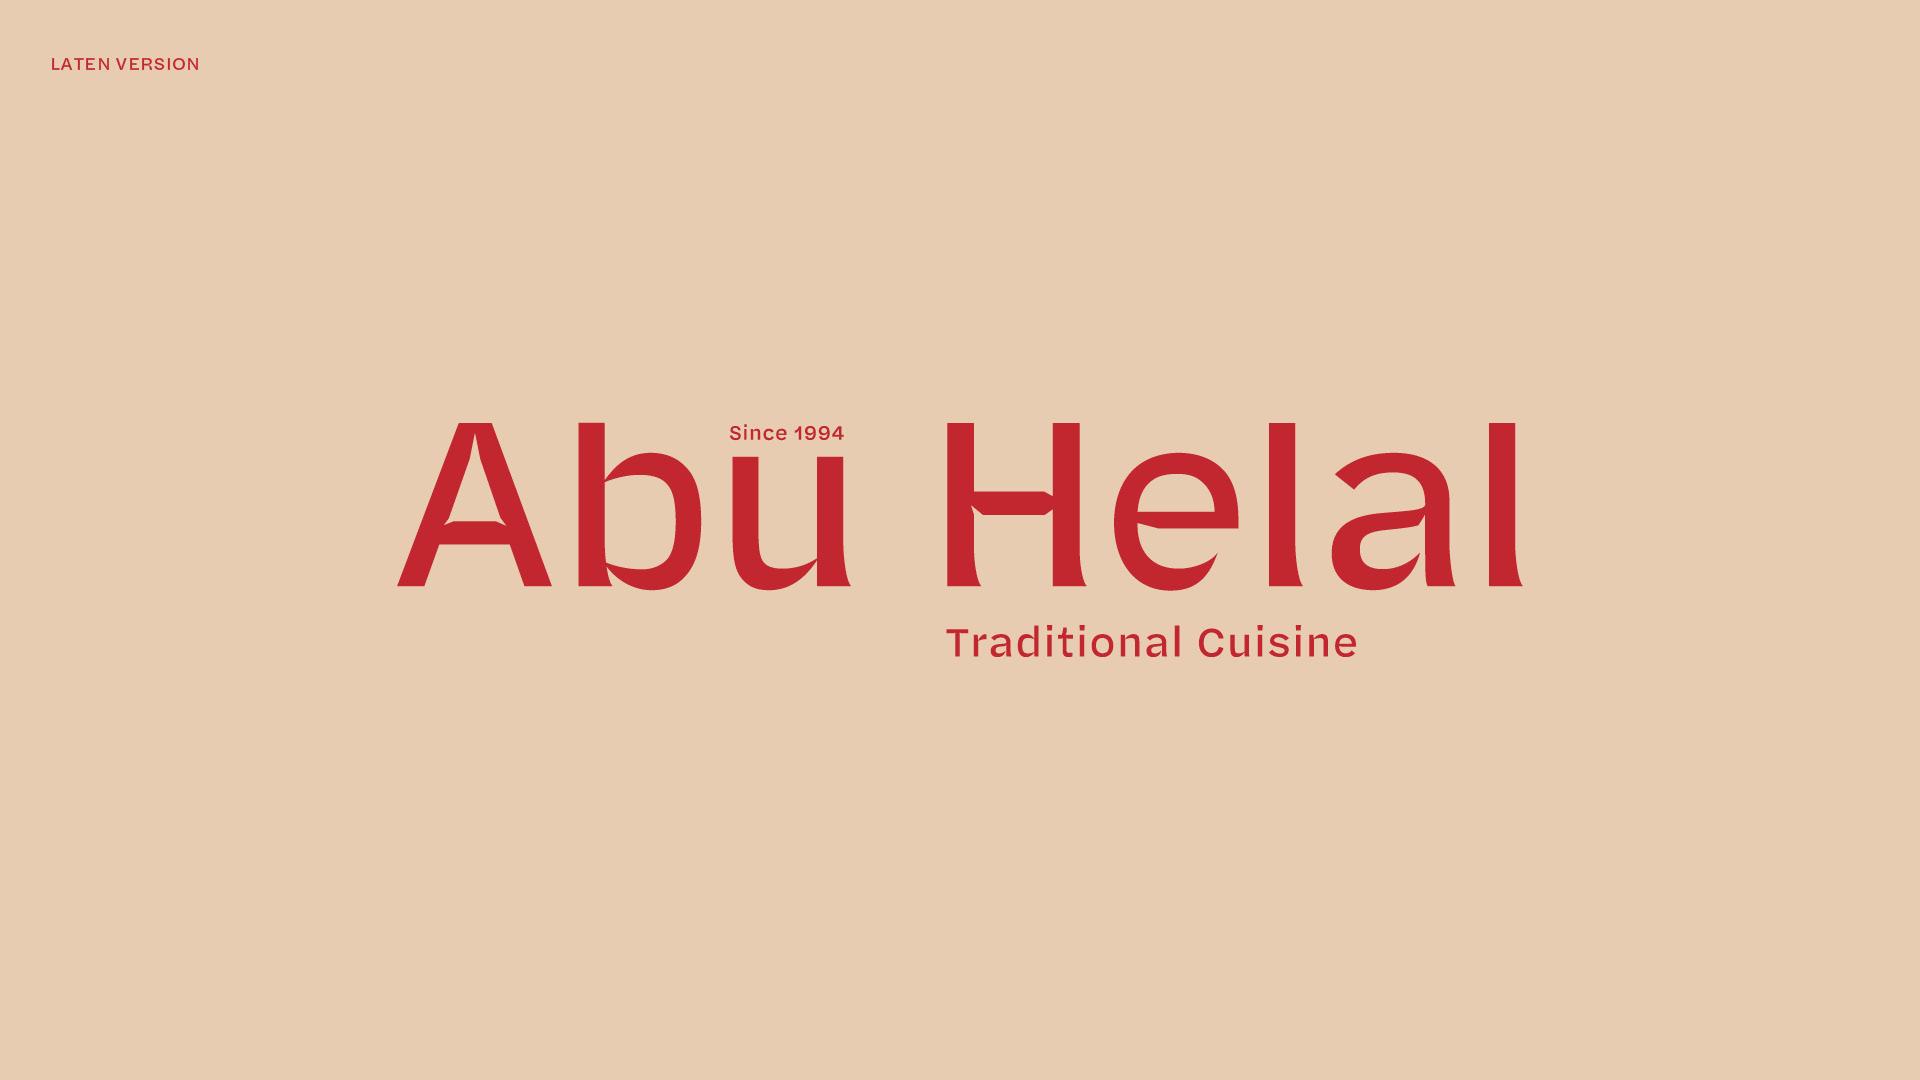 AbuHelal-Work-By-YaStudio-22